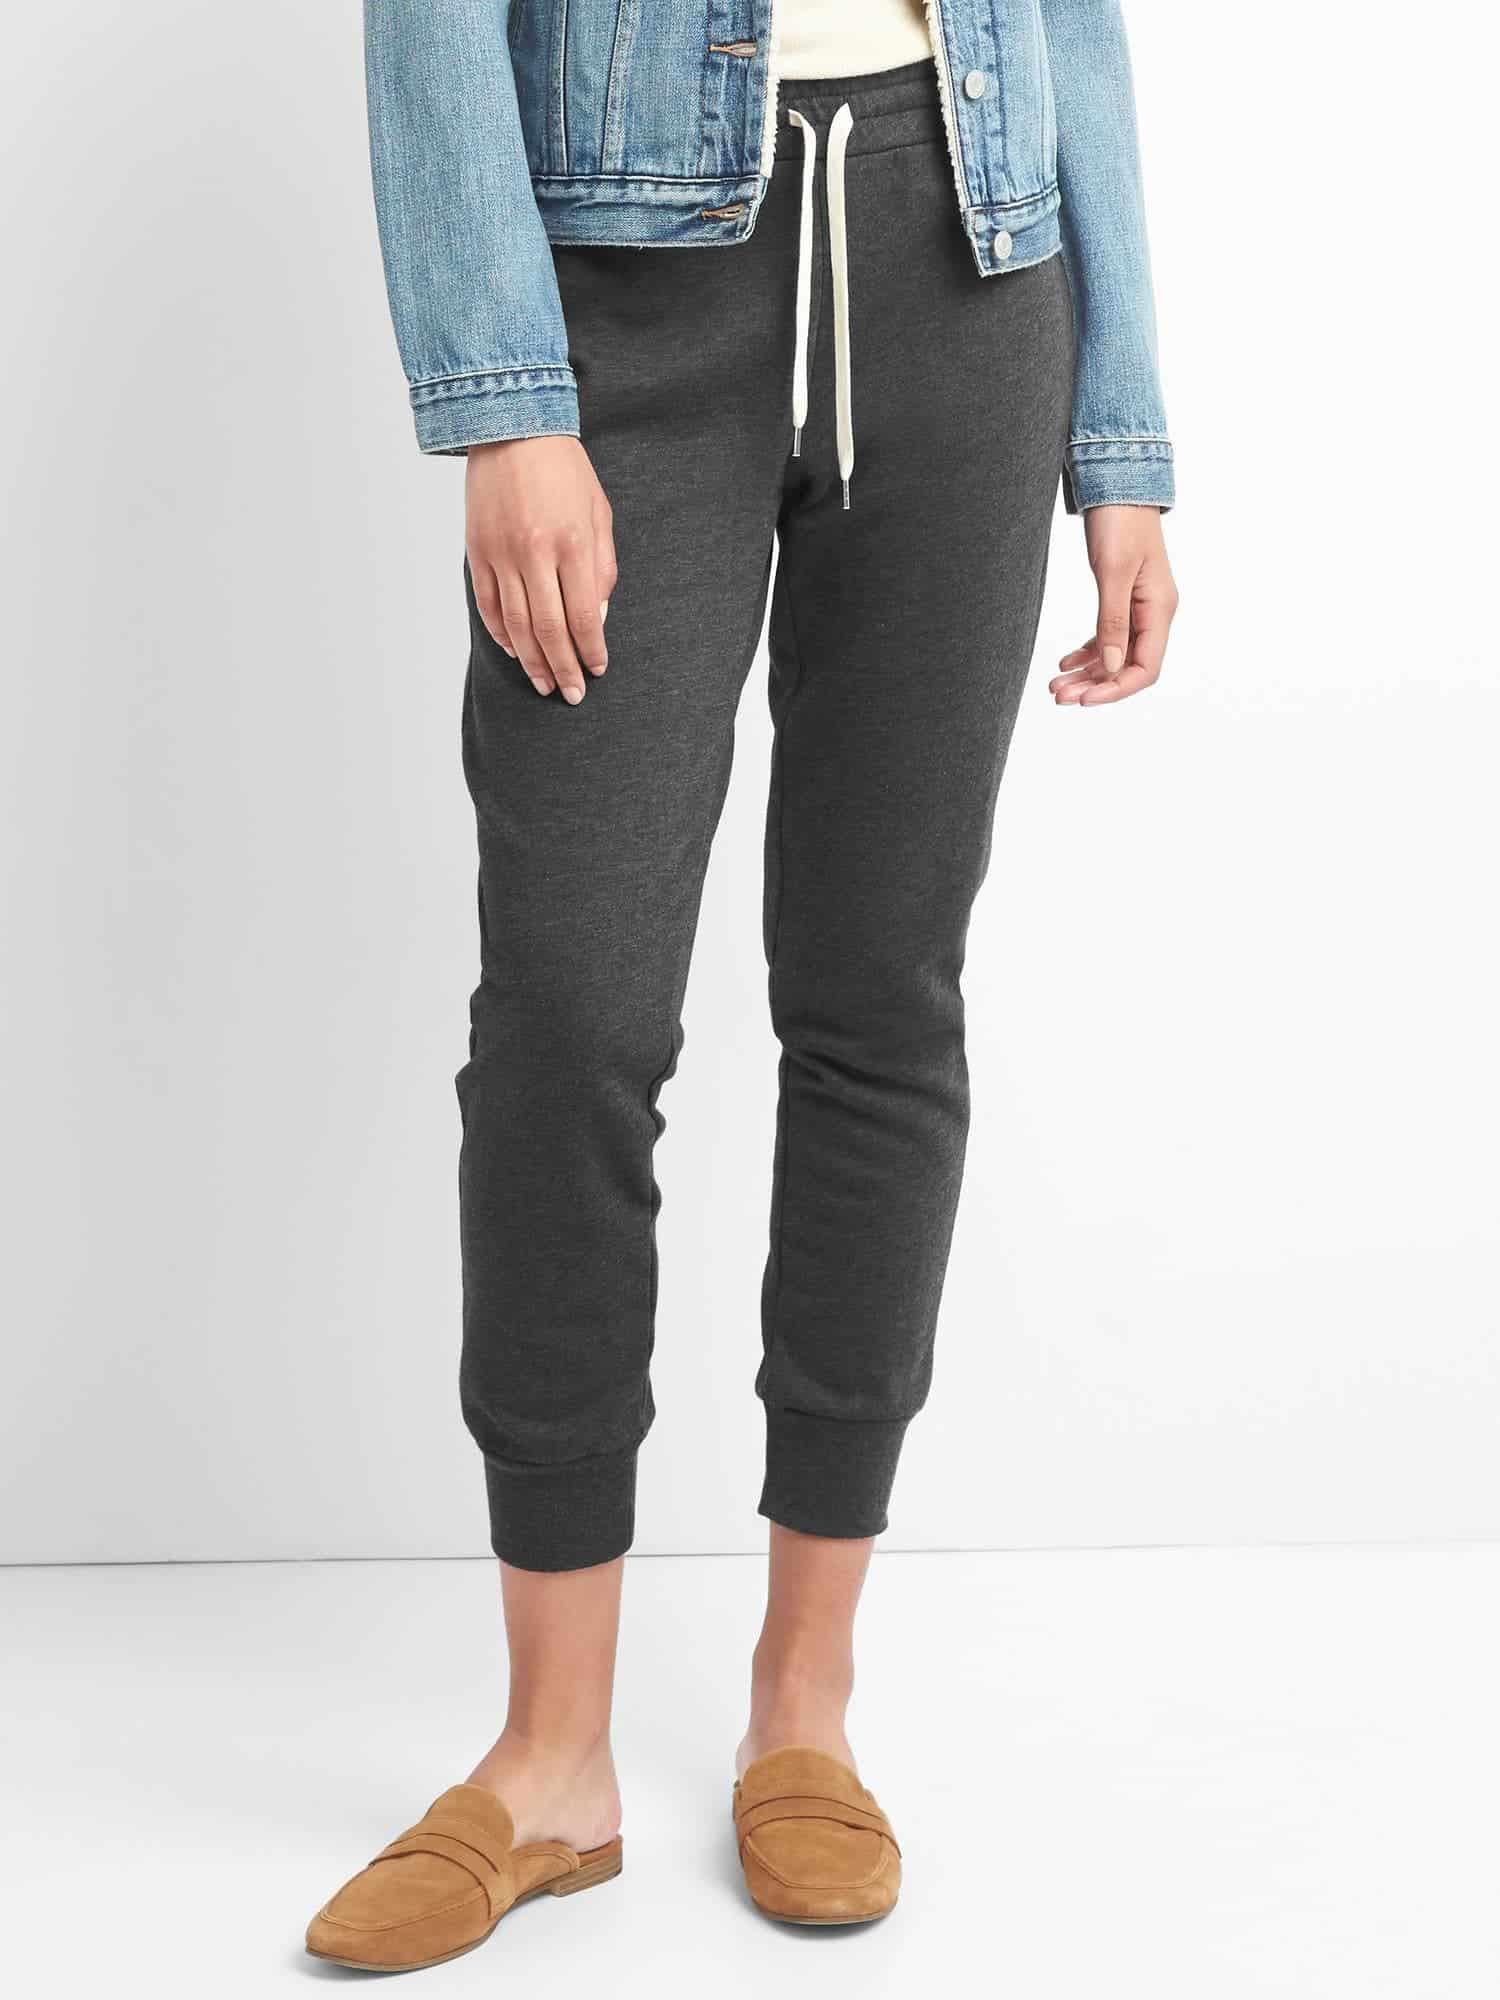 d509b3c4e14a2 Top 10 Most Comfortable Women's Sweatpants | Comfort Nerd